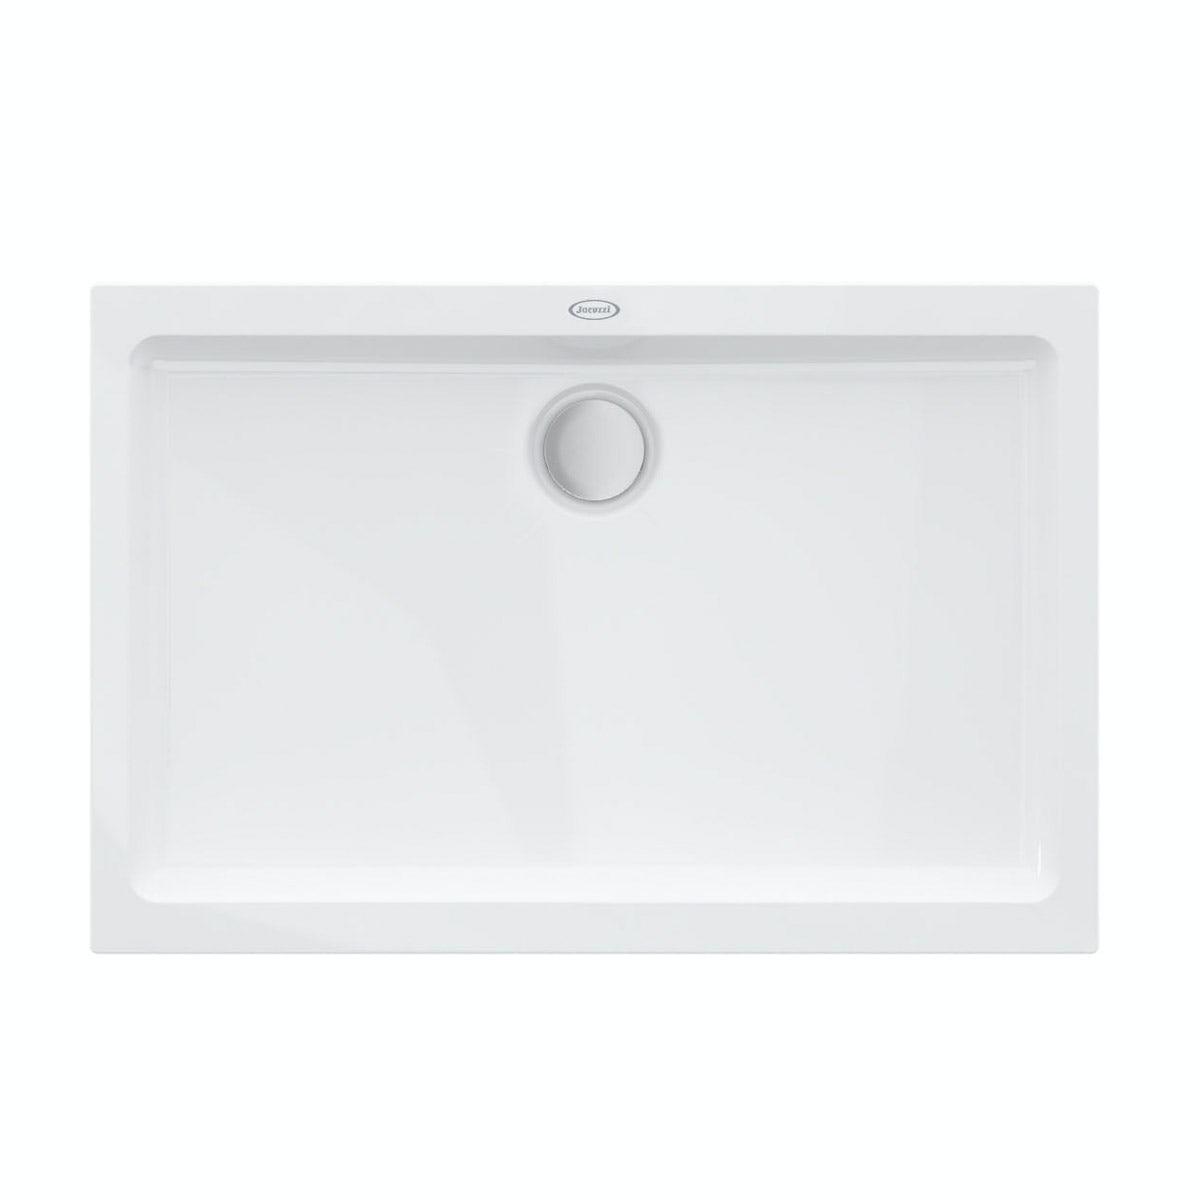 Jacuzzi Essentials matt white acrylic shower tray 1400 x 900